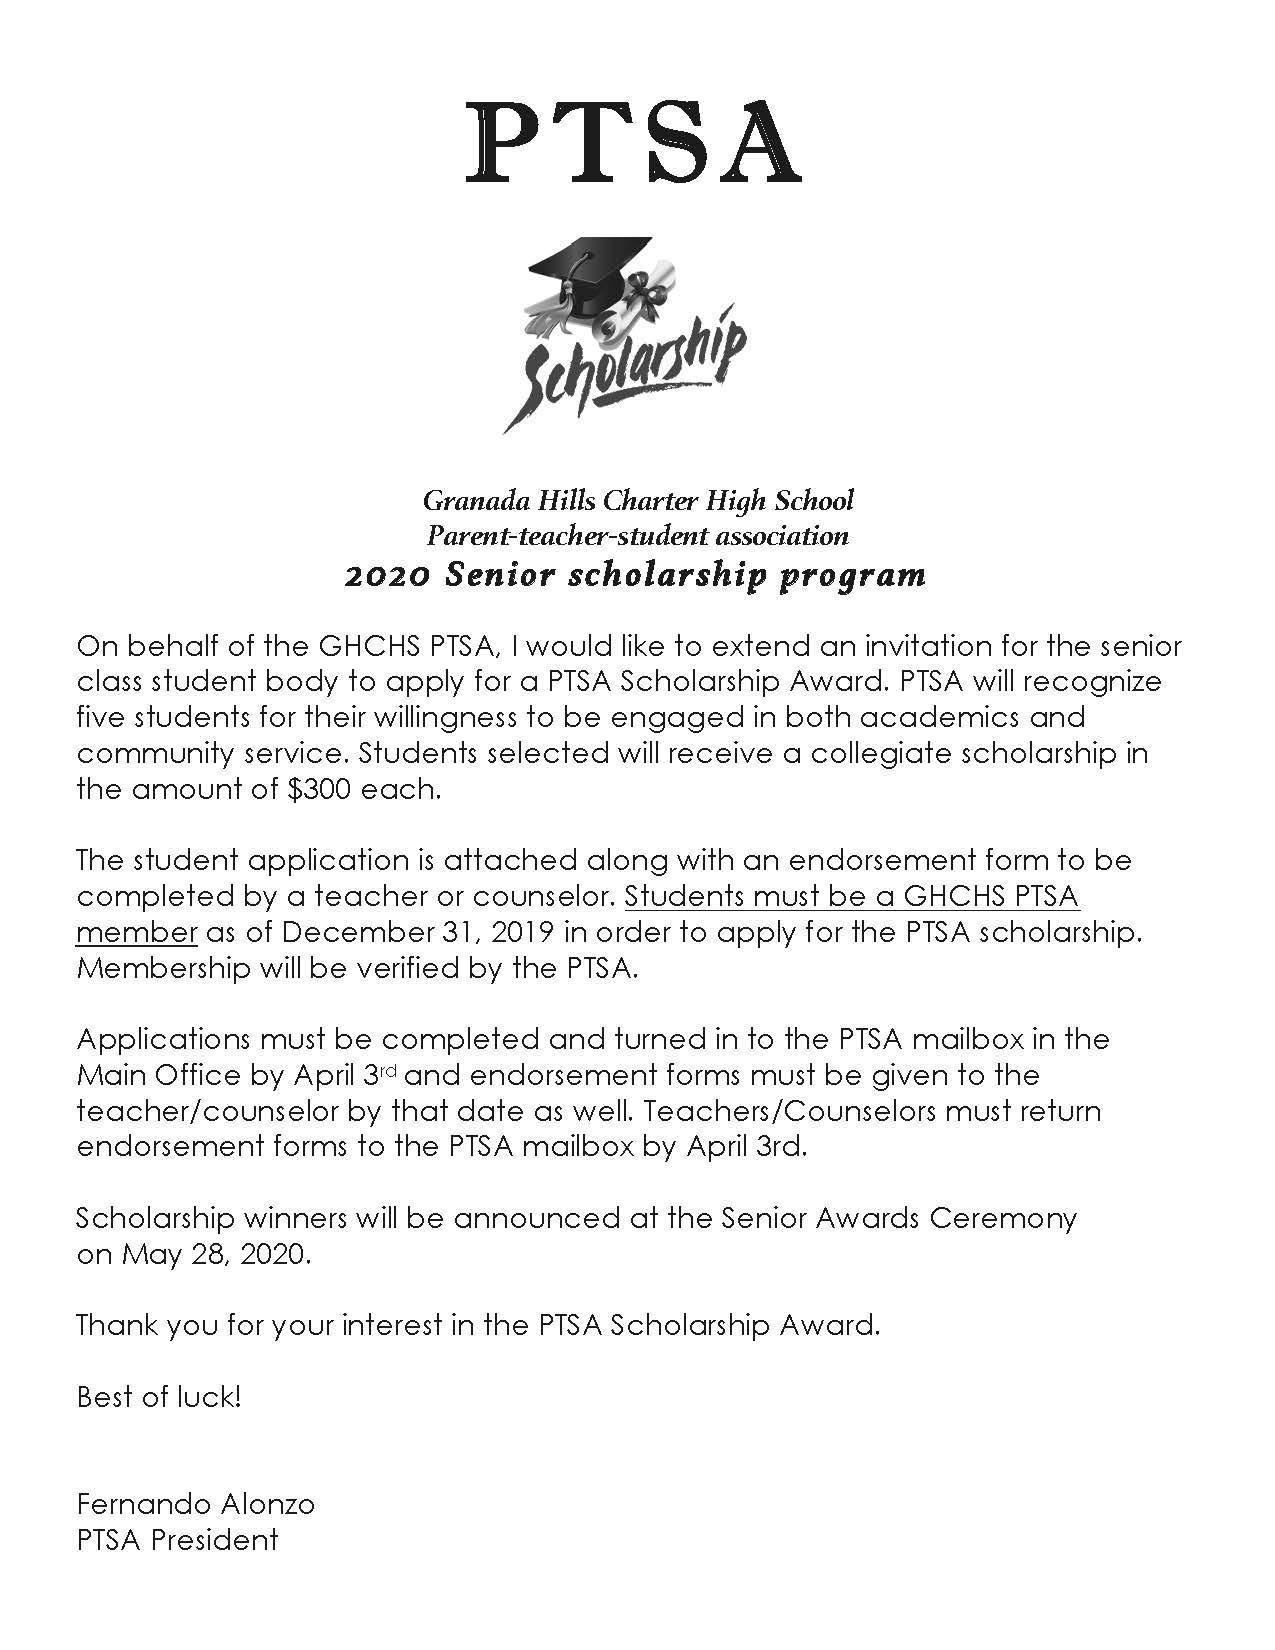 PTSA Senior Scholarship Program